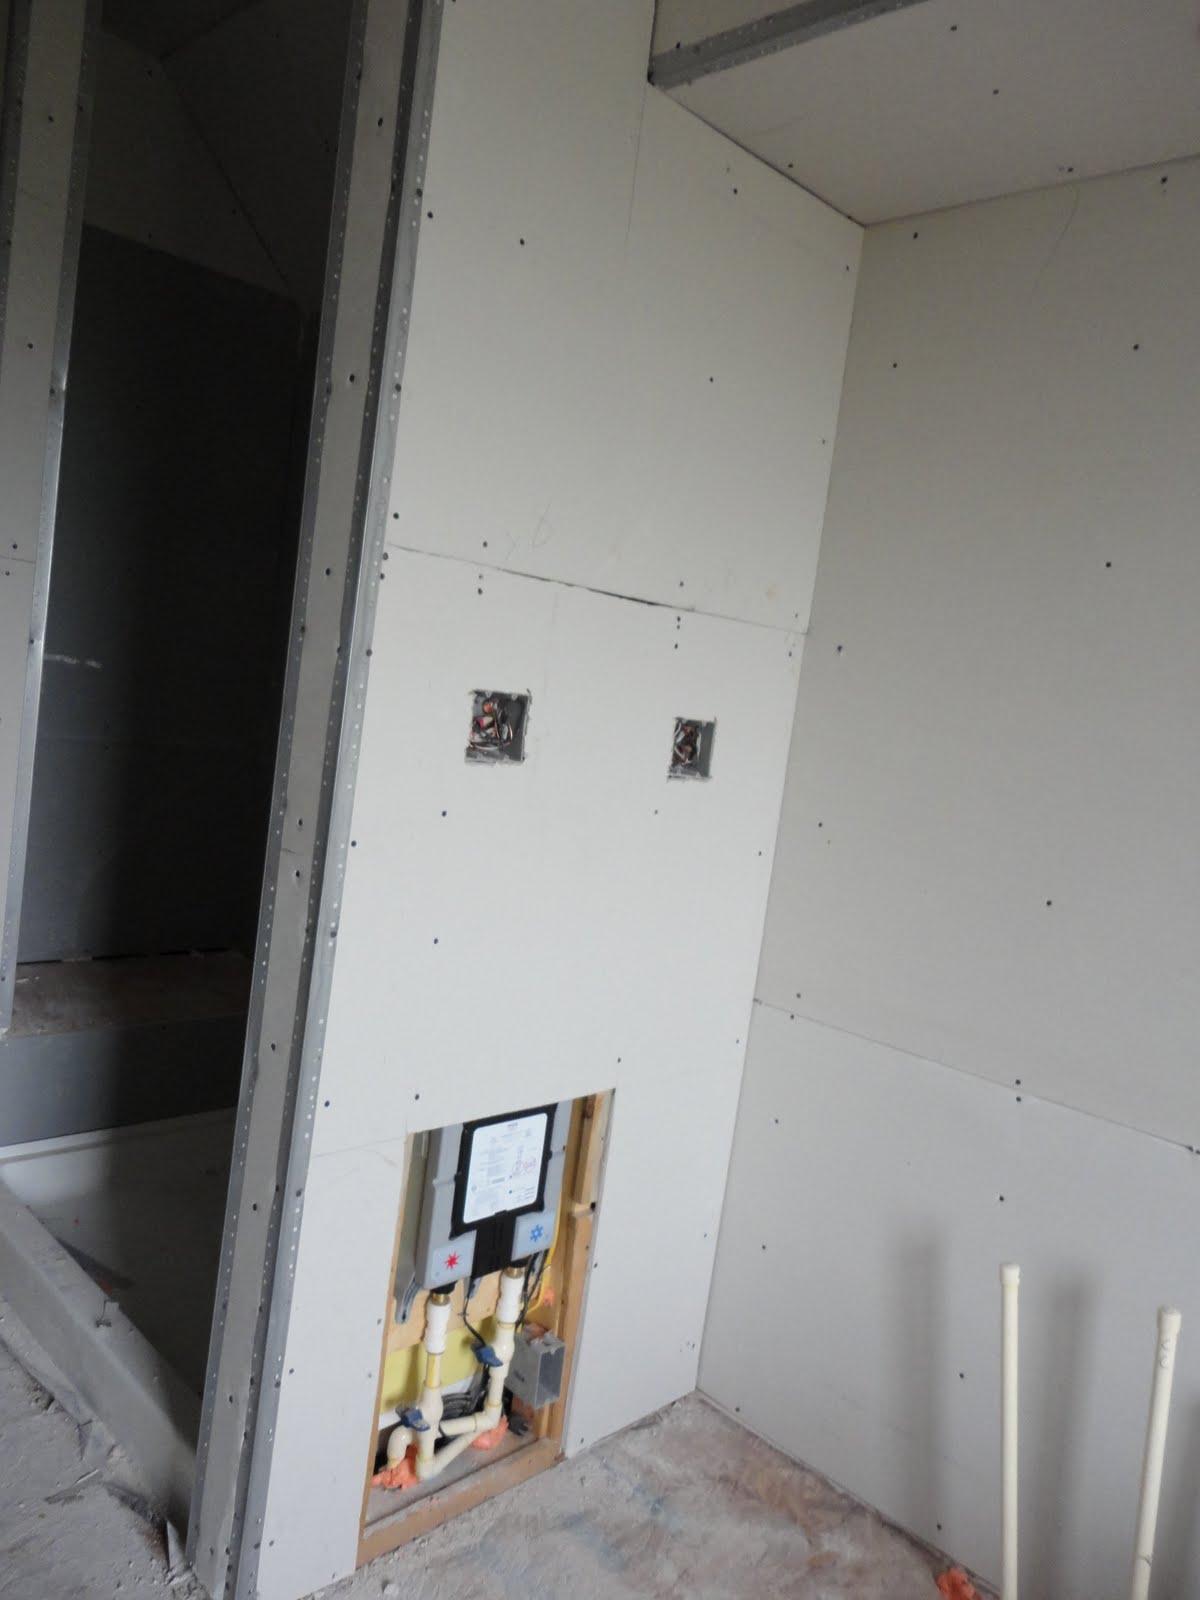 Inspiring Drywall Ceiling Jack Home Depot Gallery Simple Design